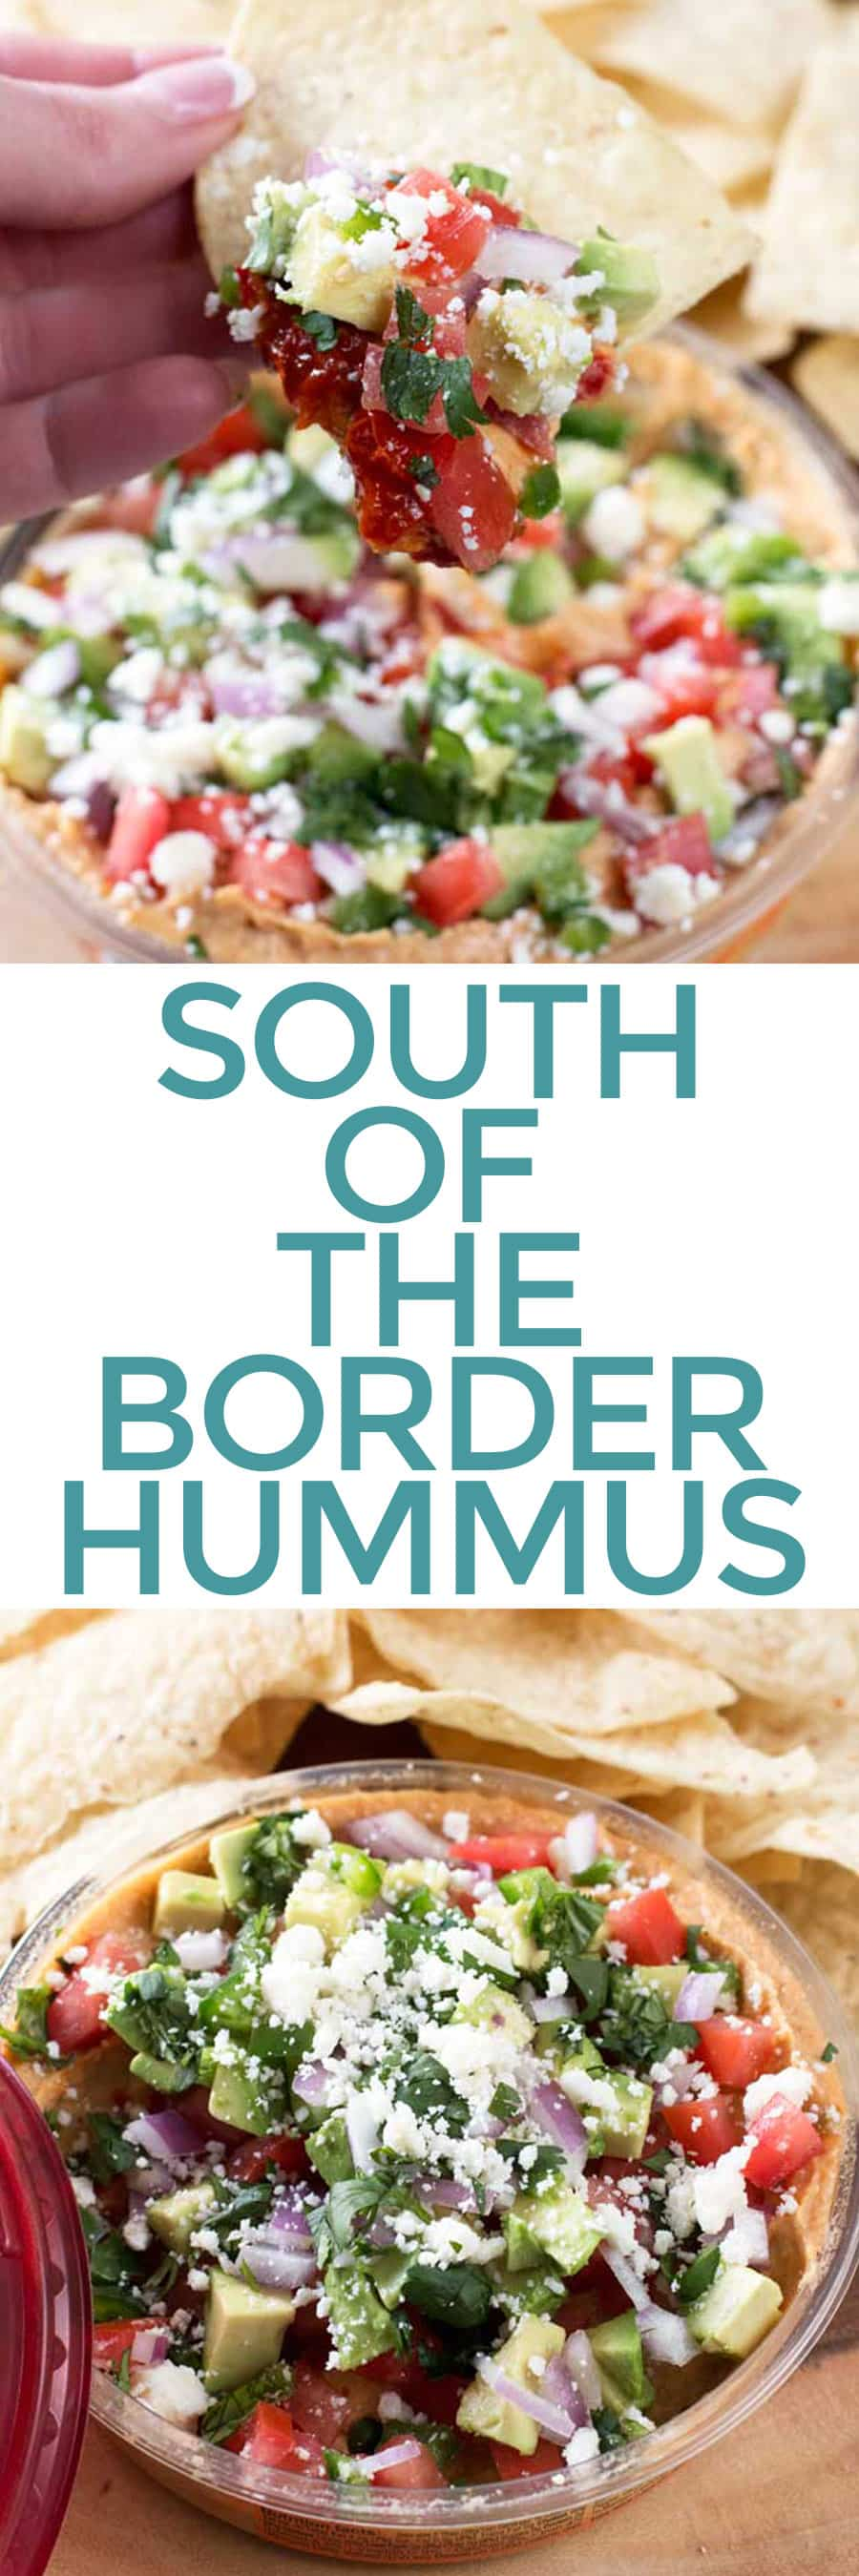 South of the Border Hummus | cakenknife.com